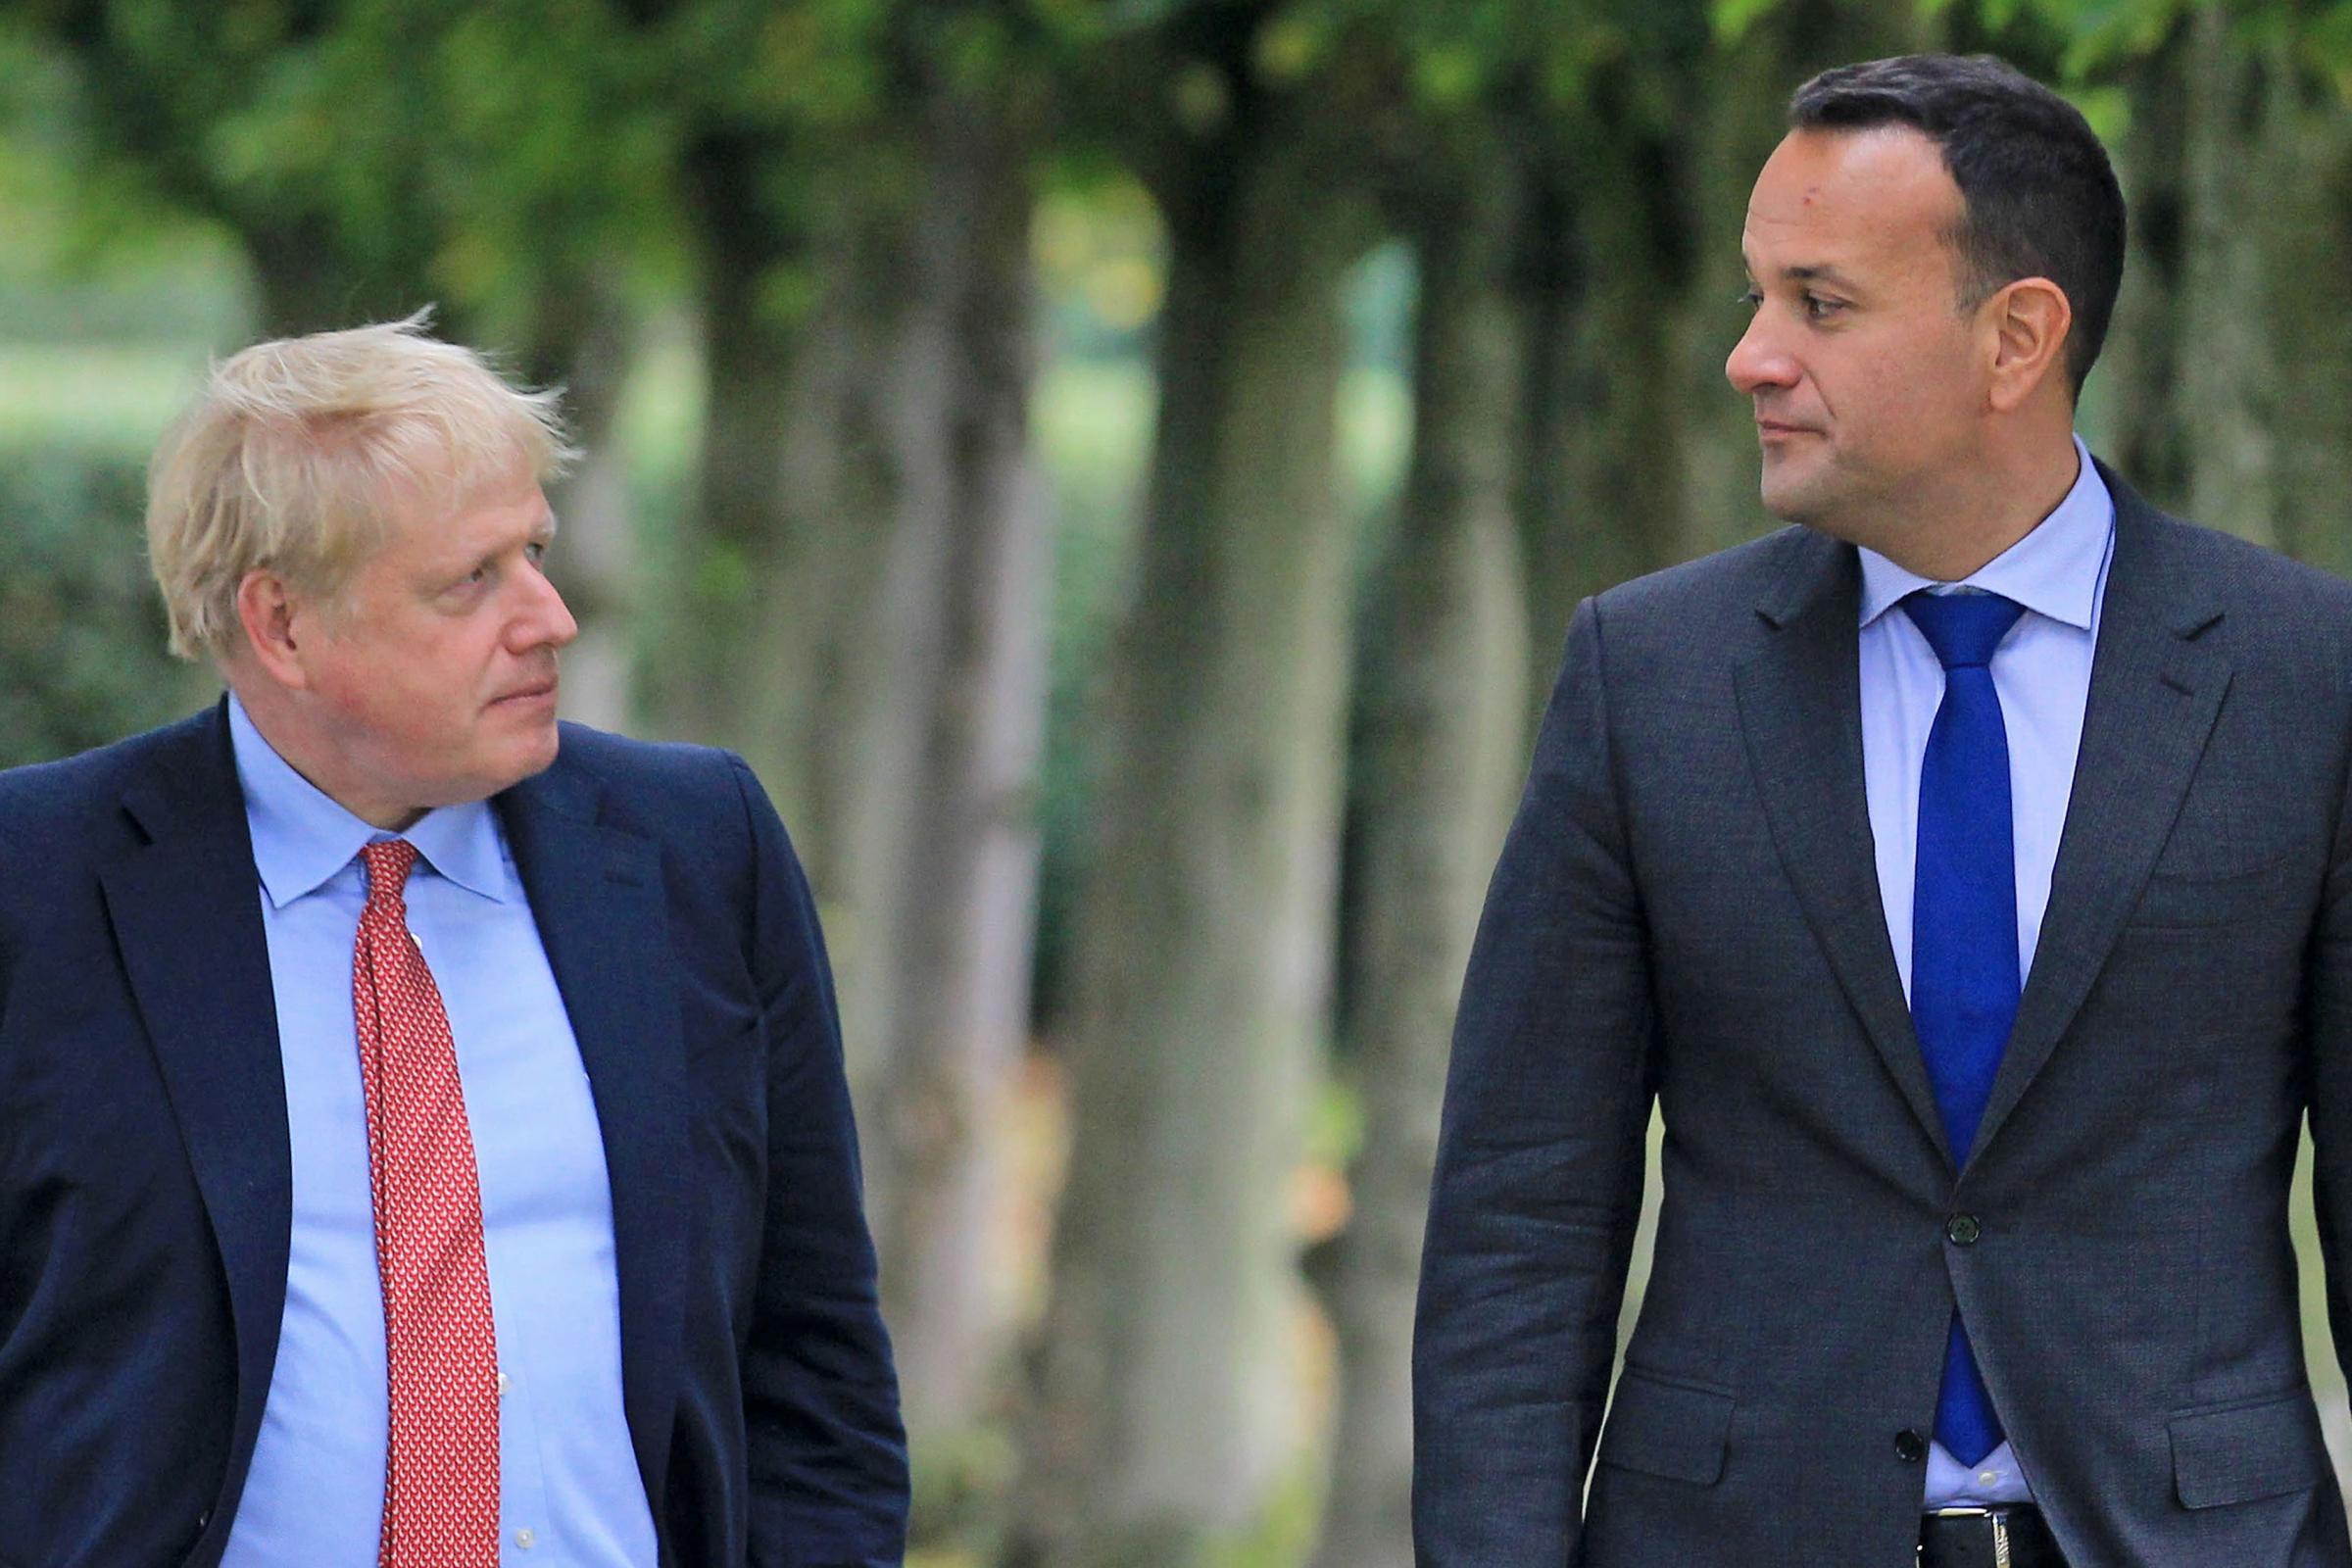 Brexit Deal Live: SNP could 'never vote' for Boris Johnson's deal